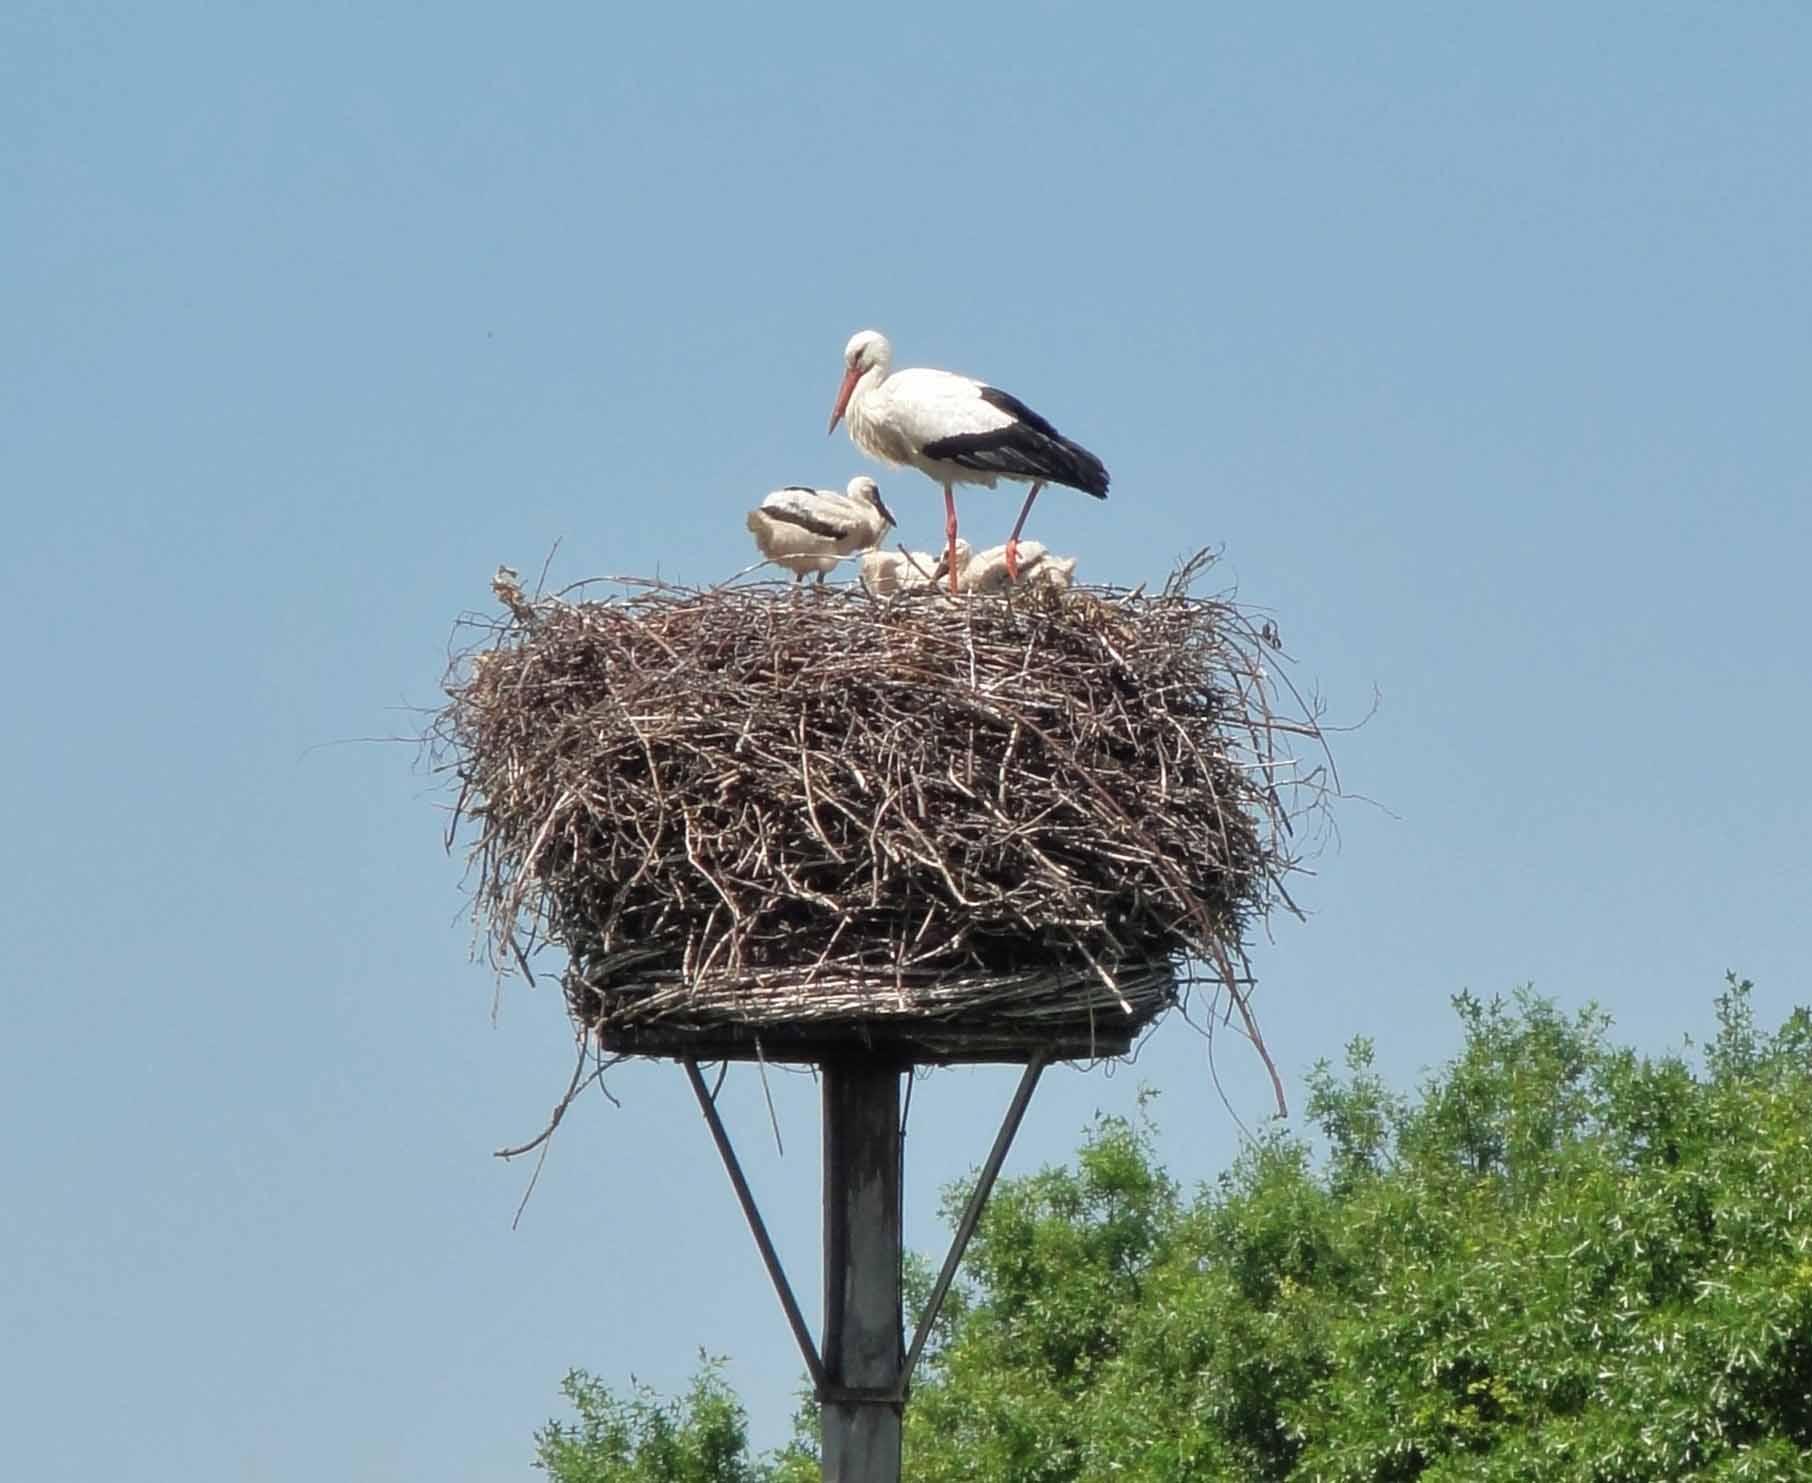 8 Erfgoeddag ooievaars nest 2018